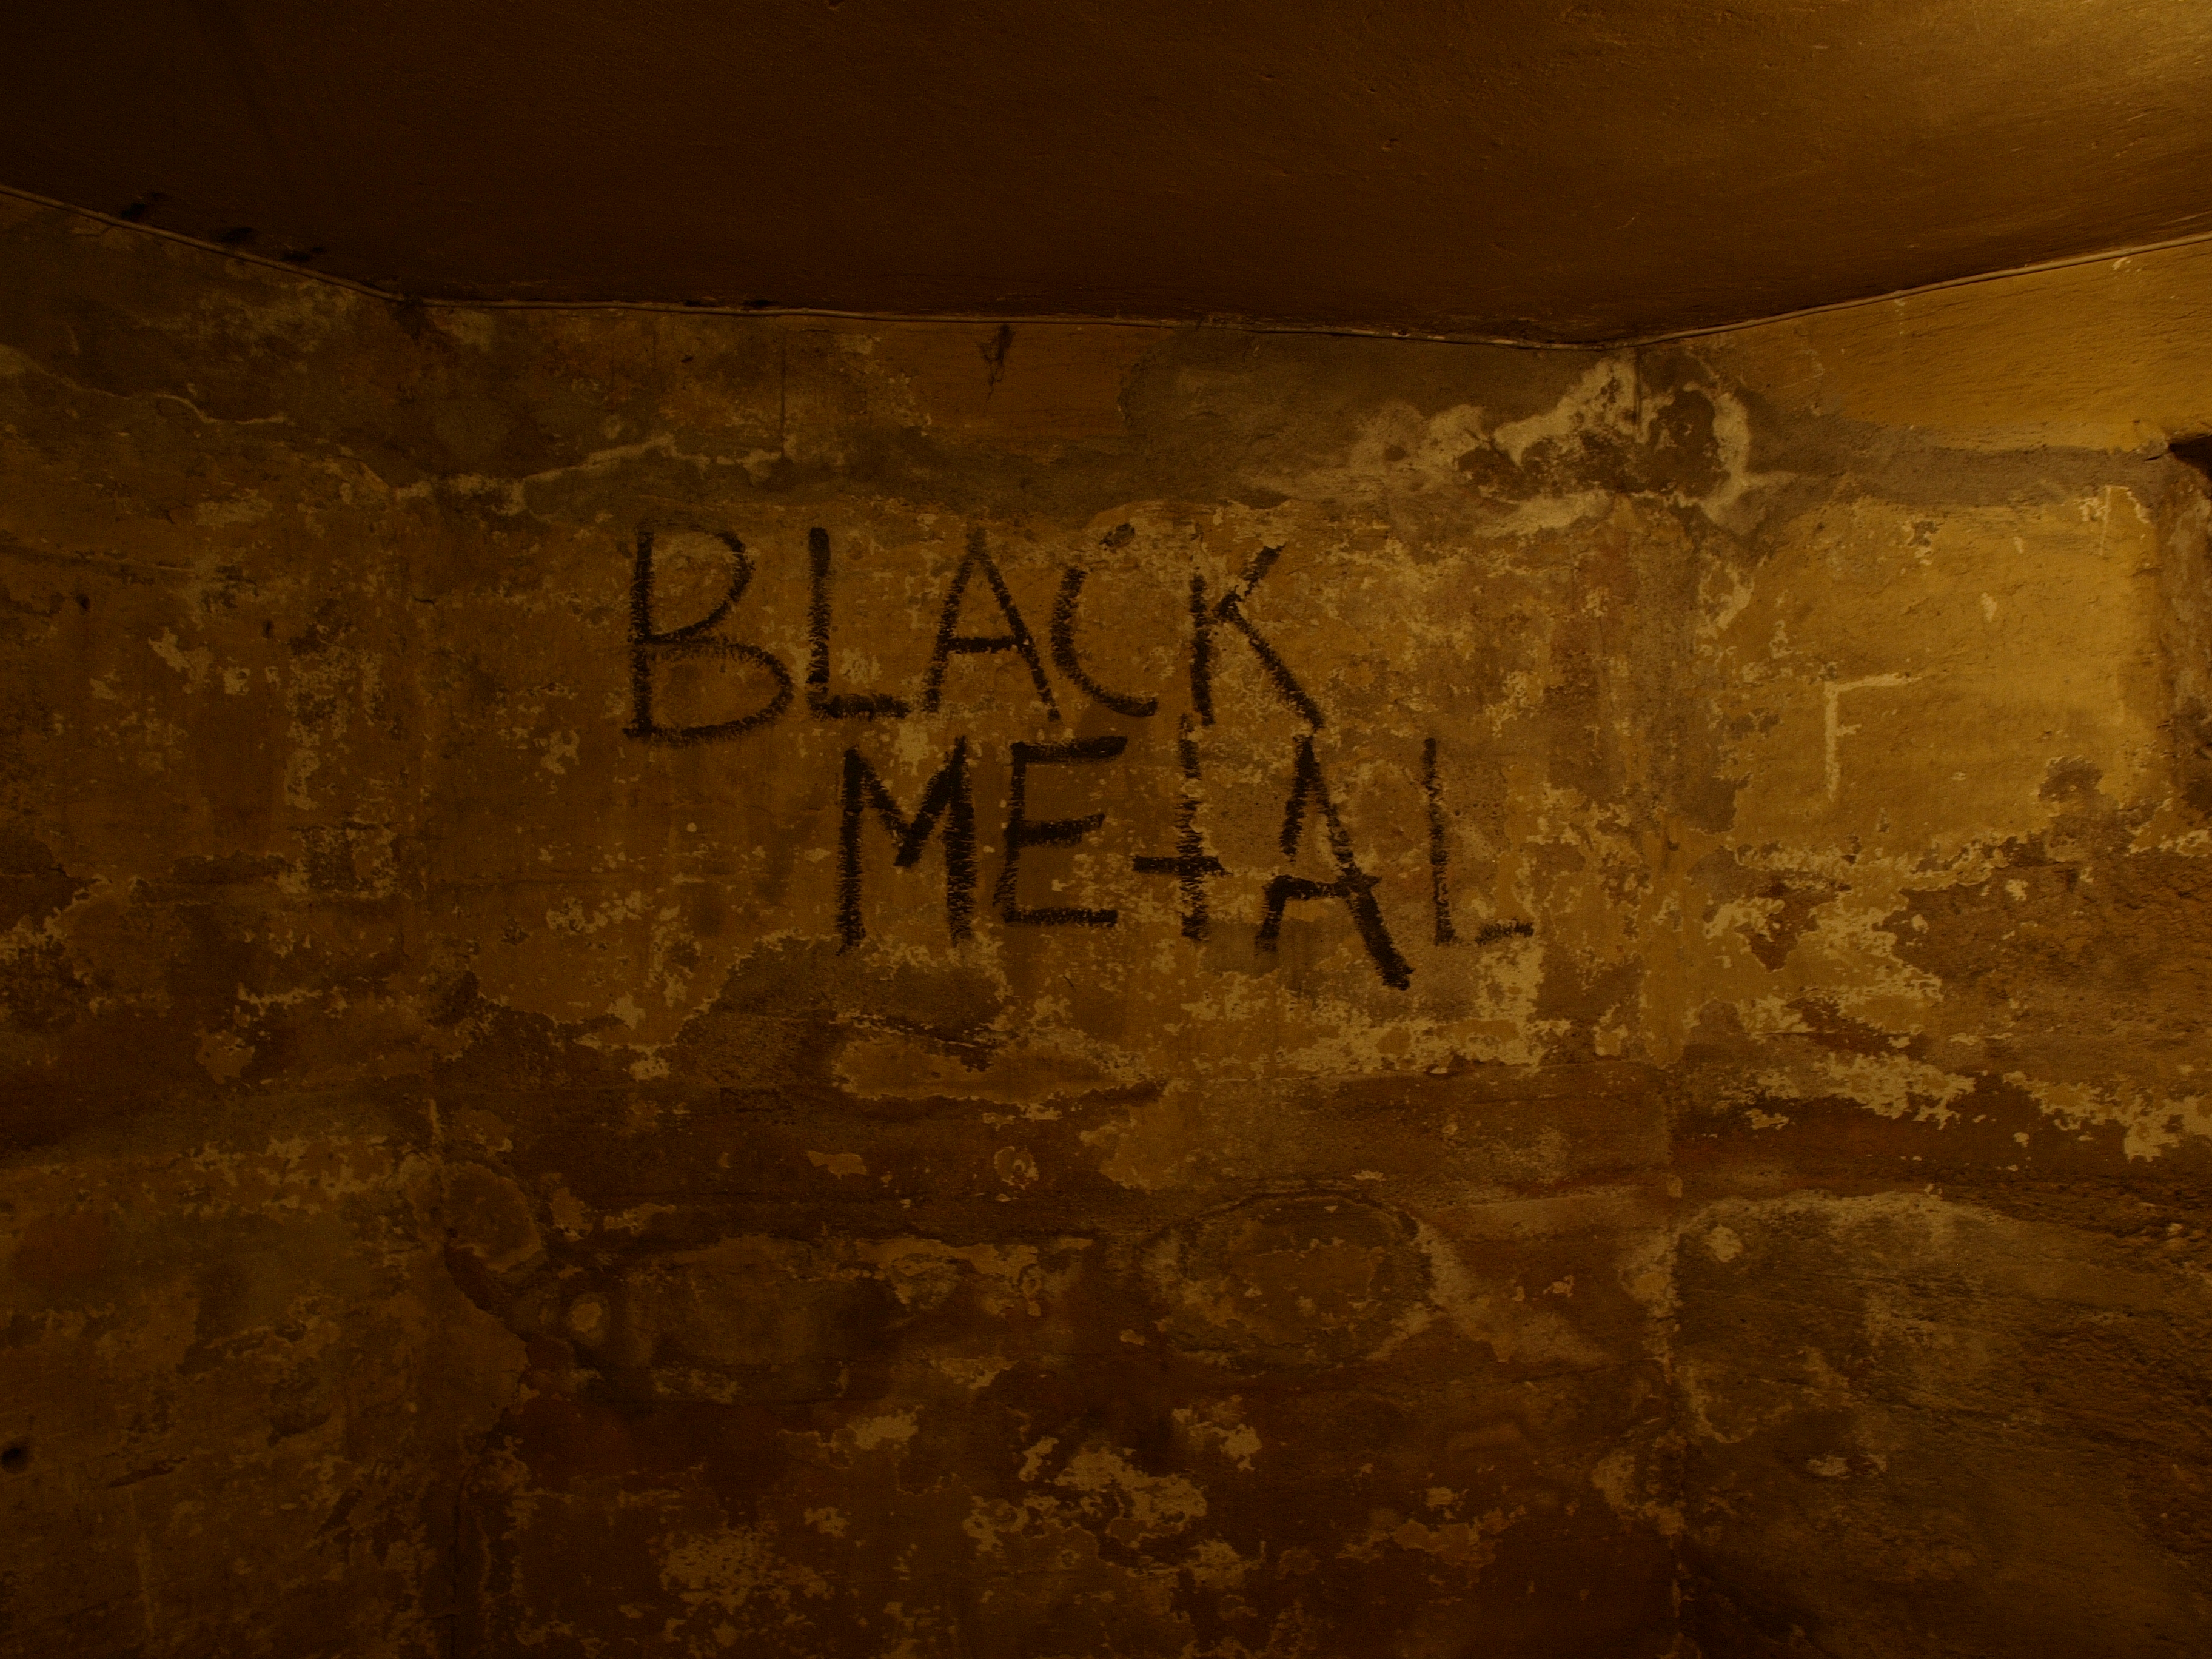 Black metal - Wikipedia